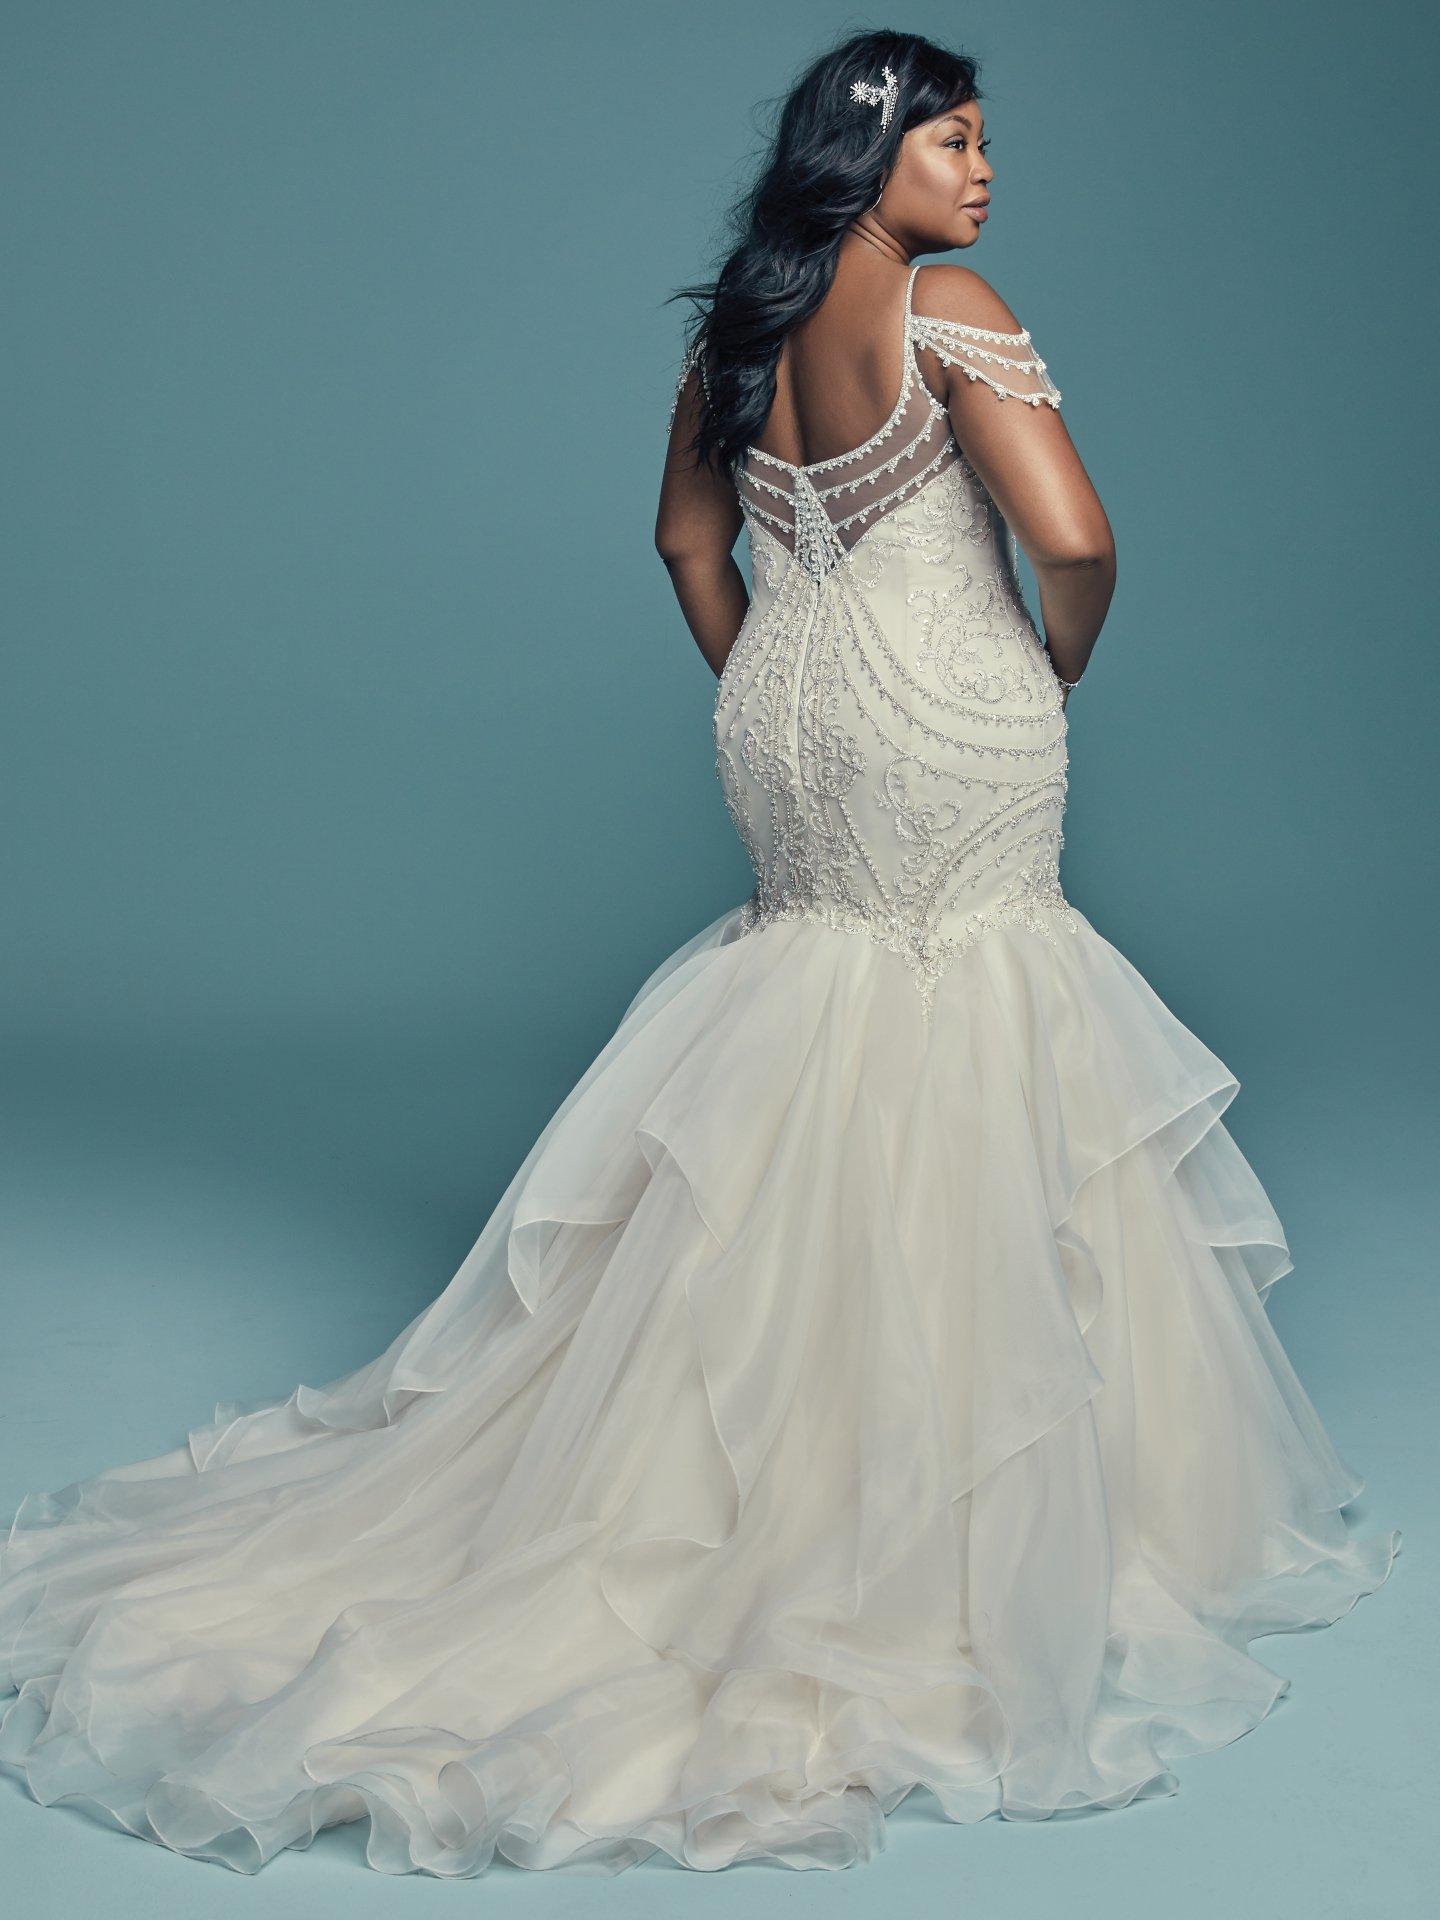 76a7fb1afb Cold Shoulder Sweetheart Neckline Beaded Bodice Organza Skirt Mermaid  Wedding Dress